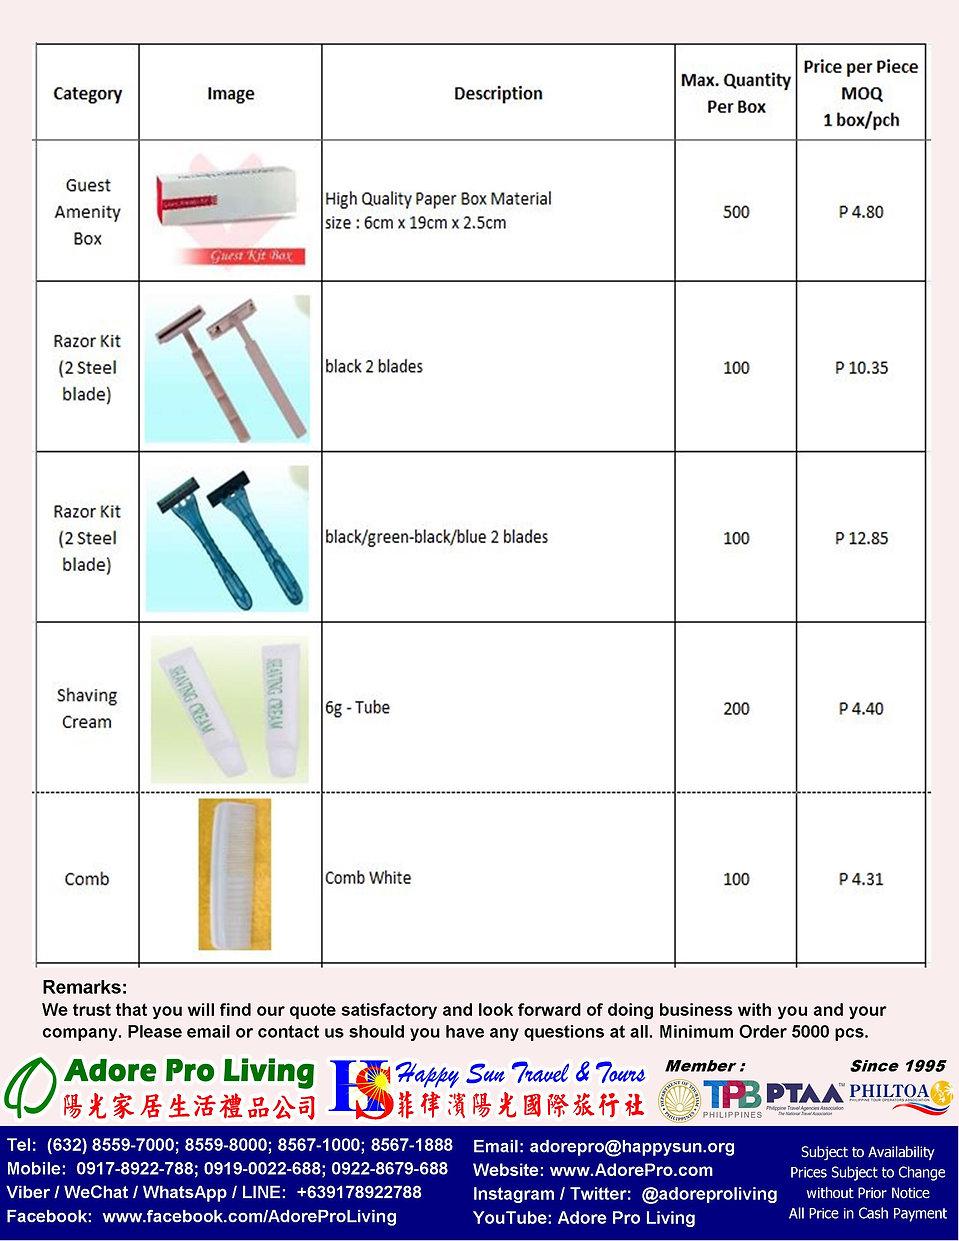 P7_201209_AdorePro_Hotel Linen.jpg